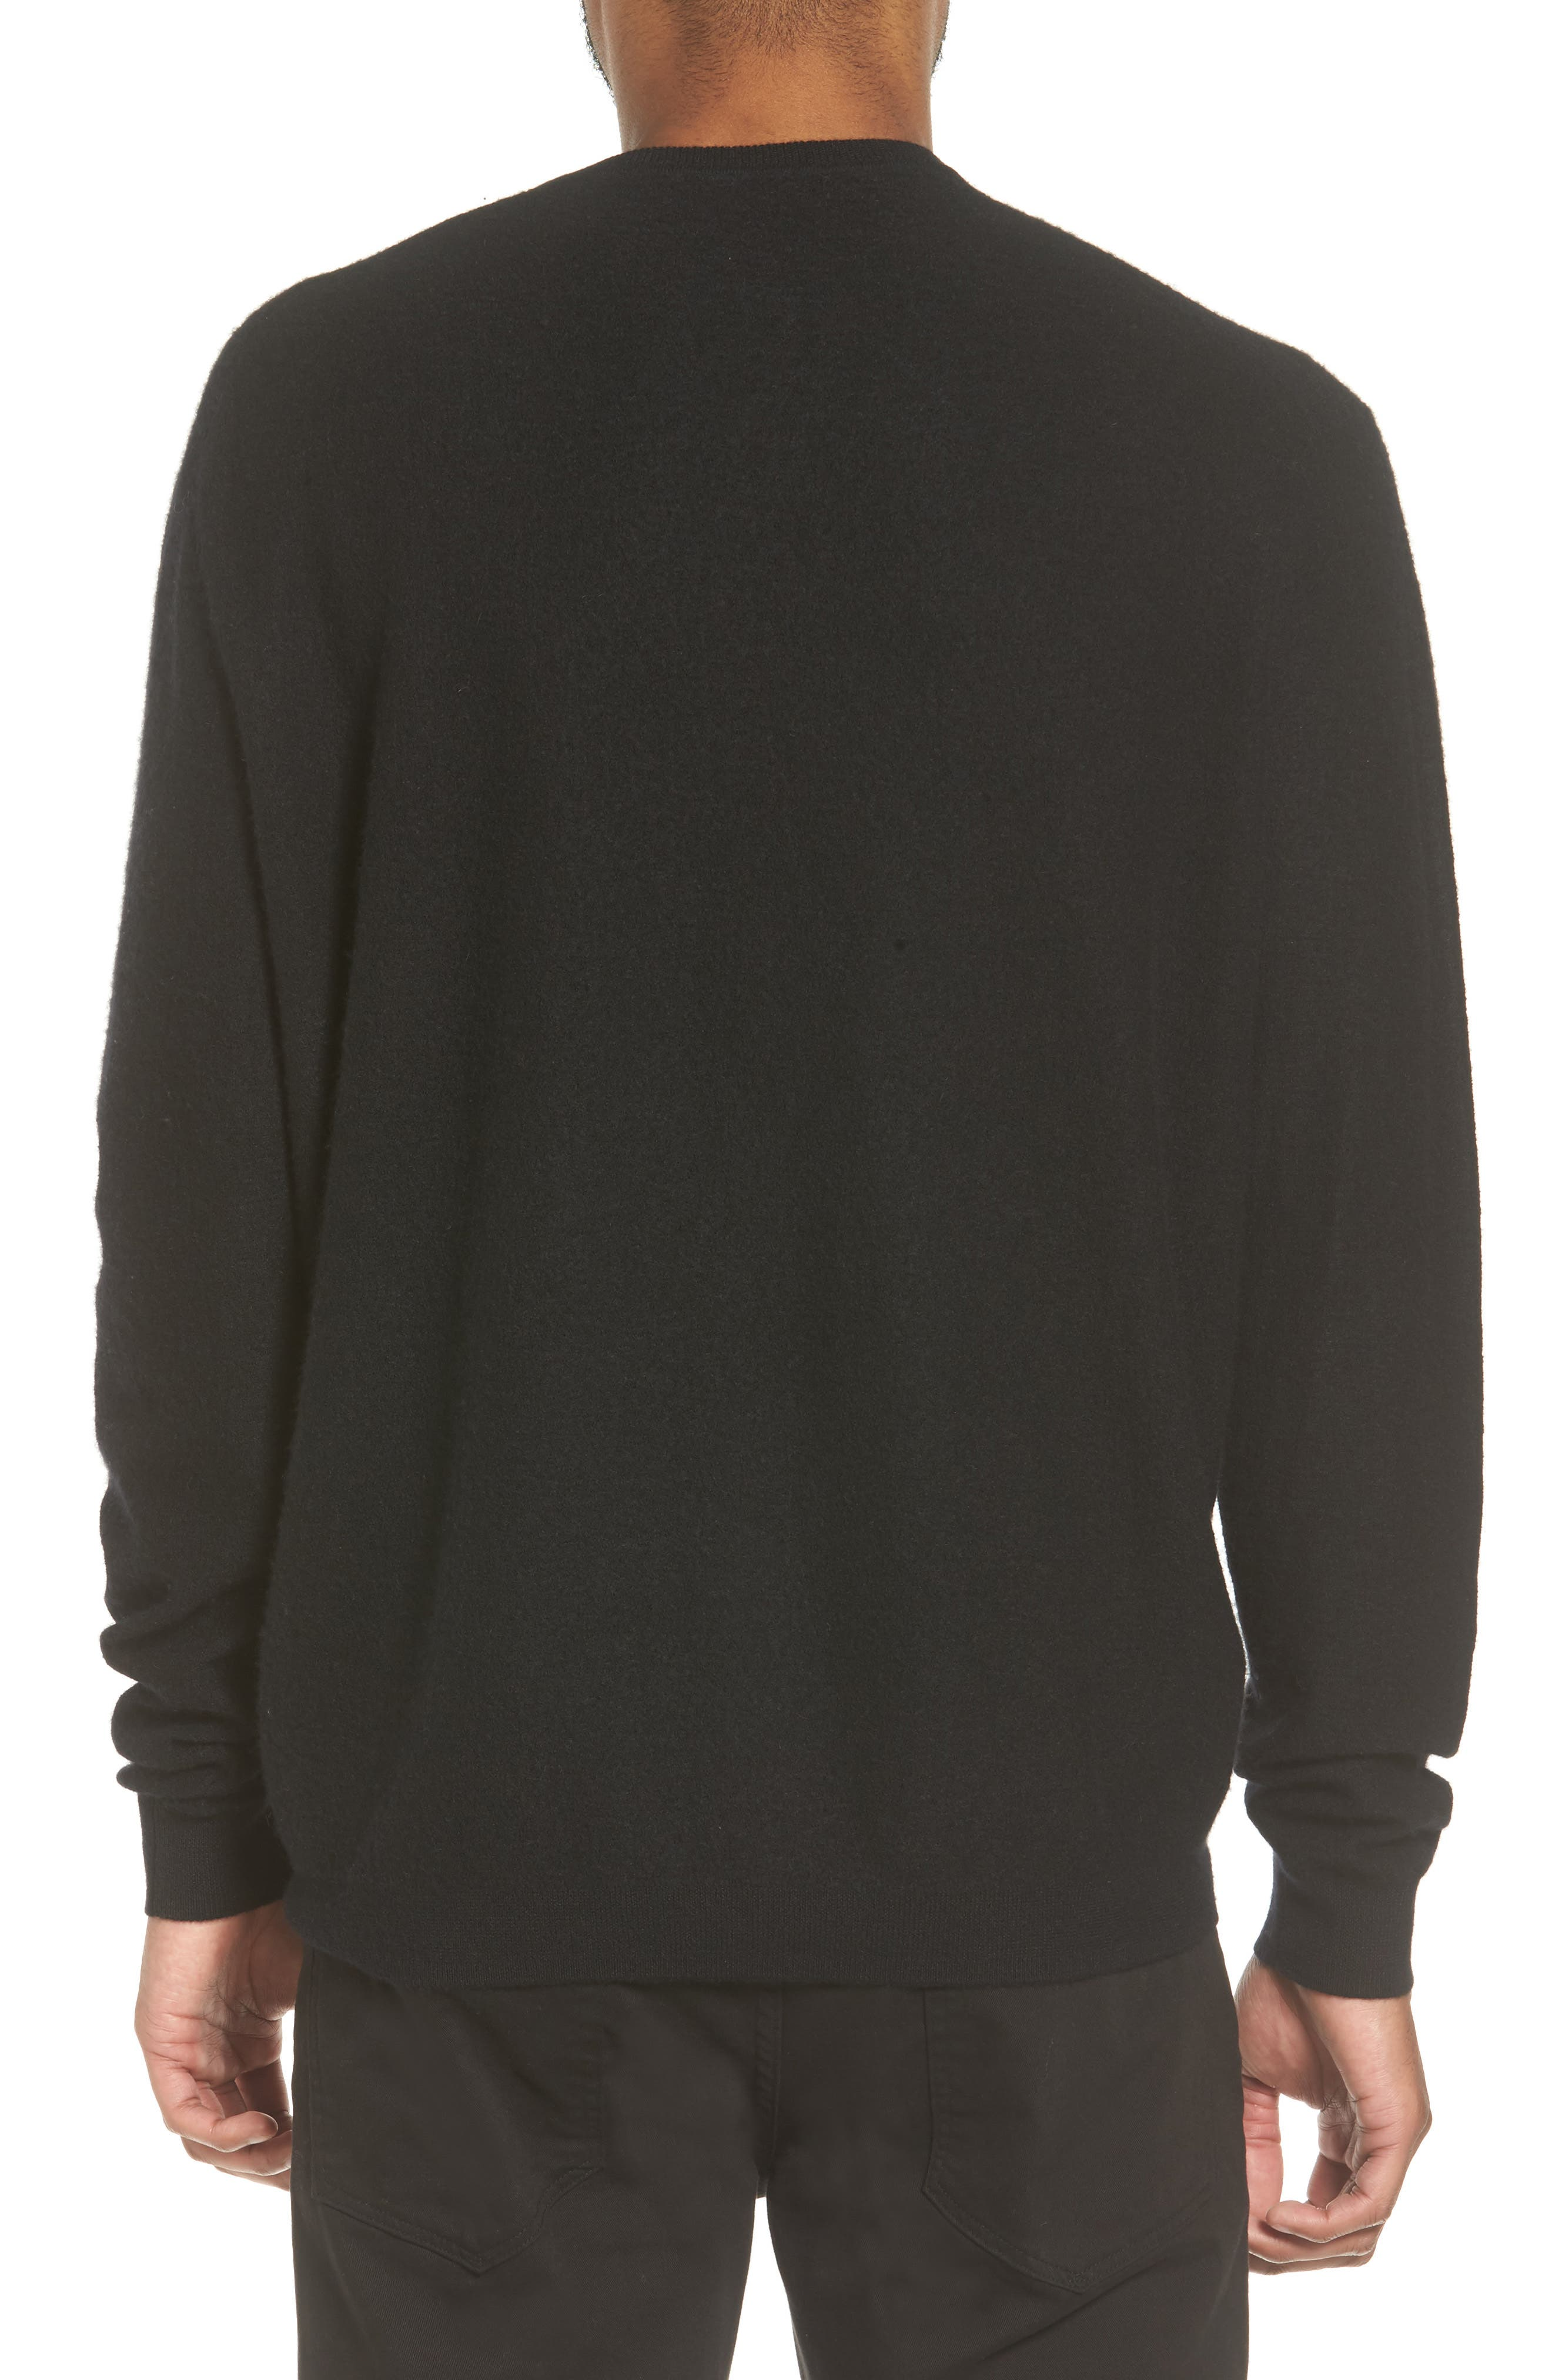 Cashmere Crewneck Sweater,                             Alternate thumbnail 2, color,                             001